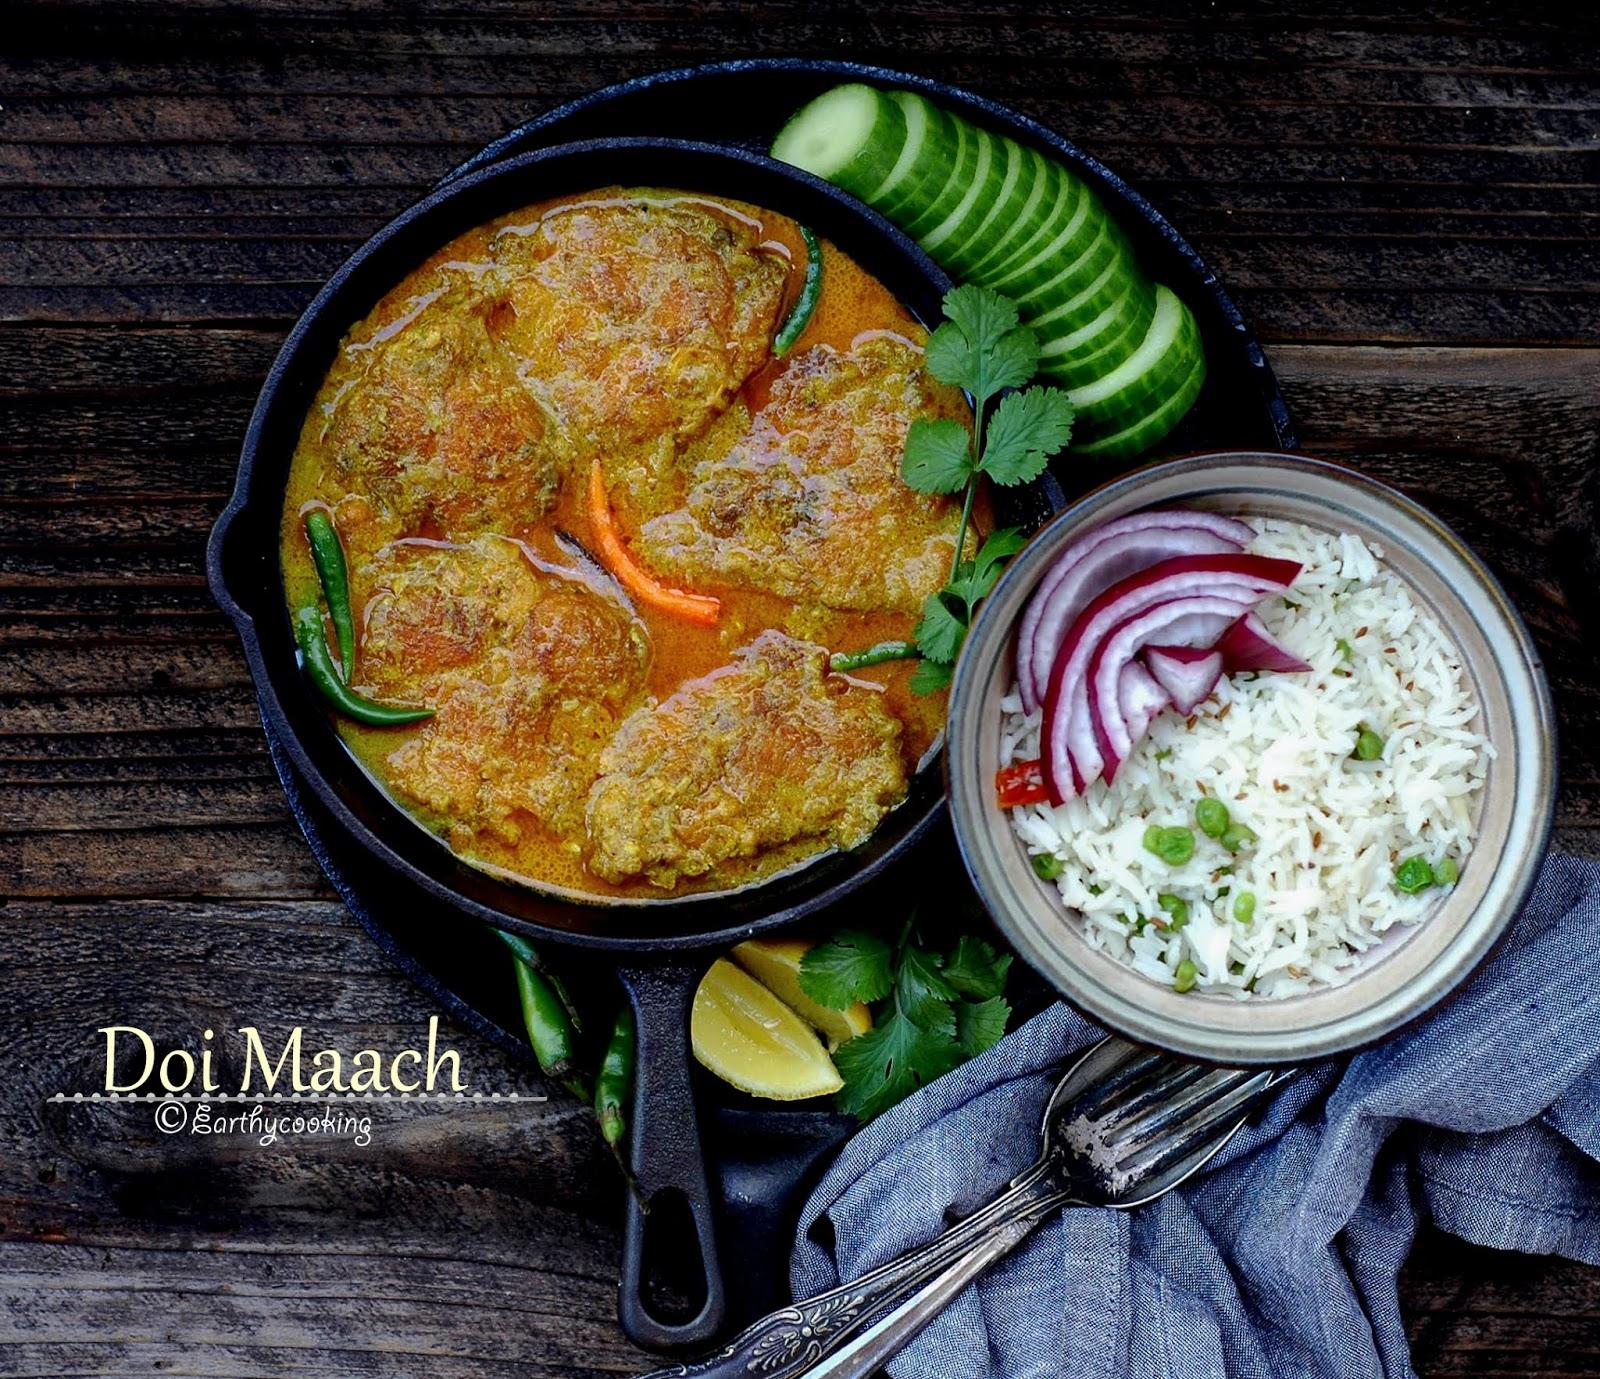 Earthycooking : Doi Maach/Fish in Yogurt Sauce